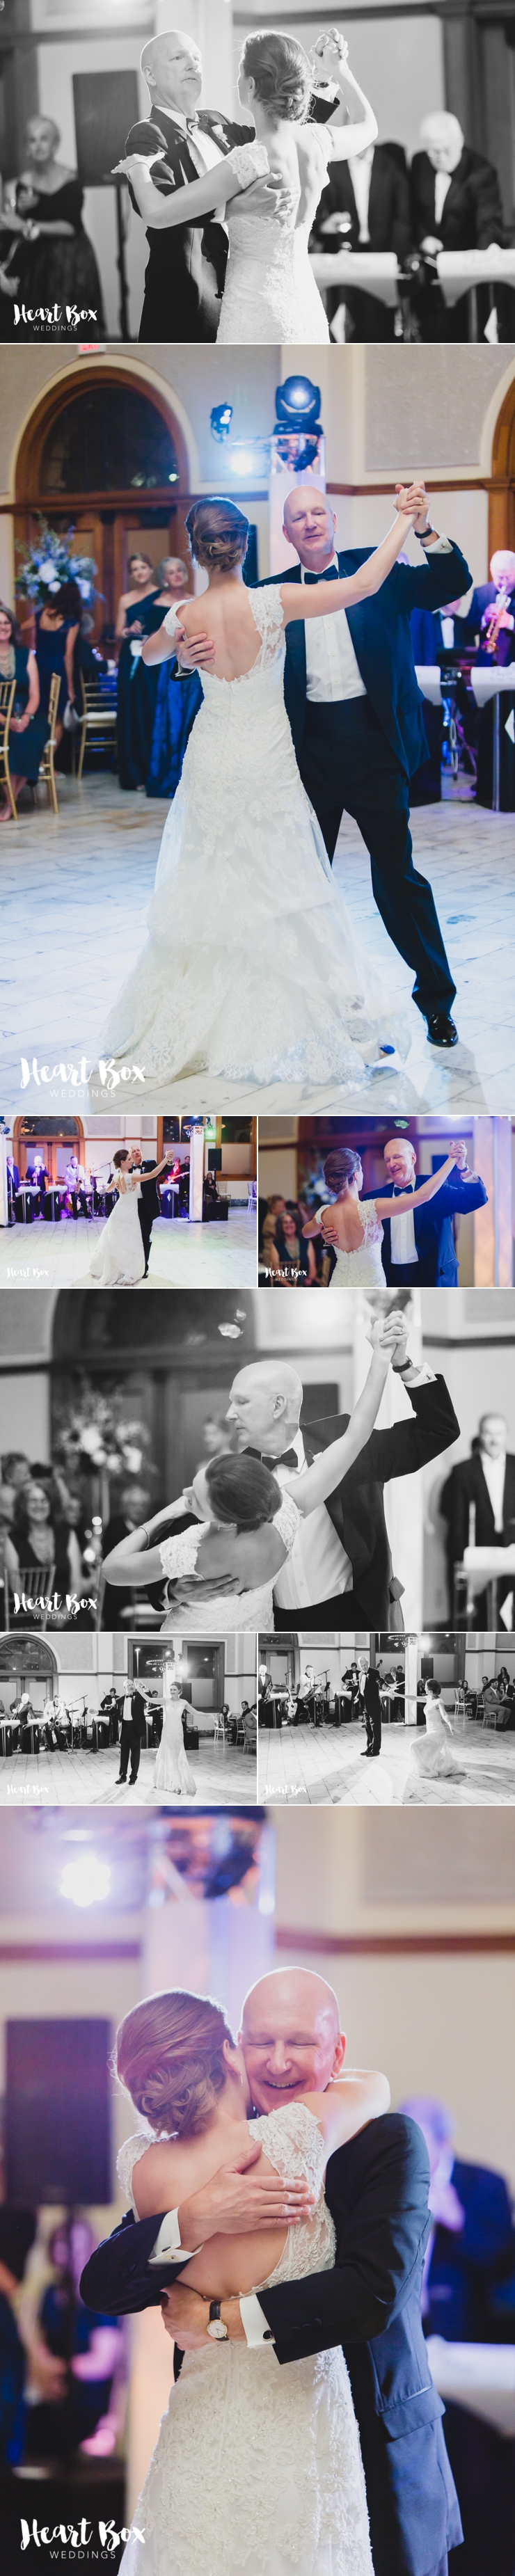 Anthony Wedding Blog Collages 20.jpg